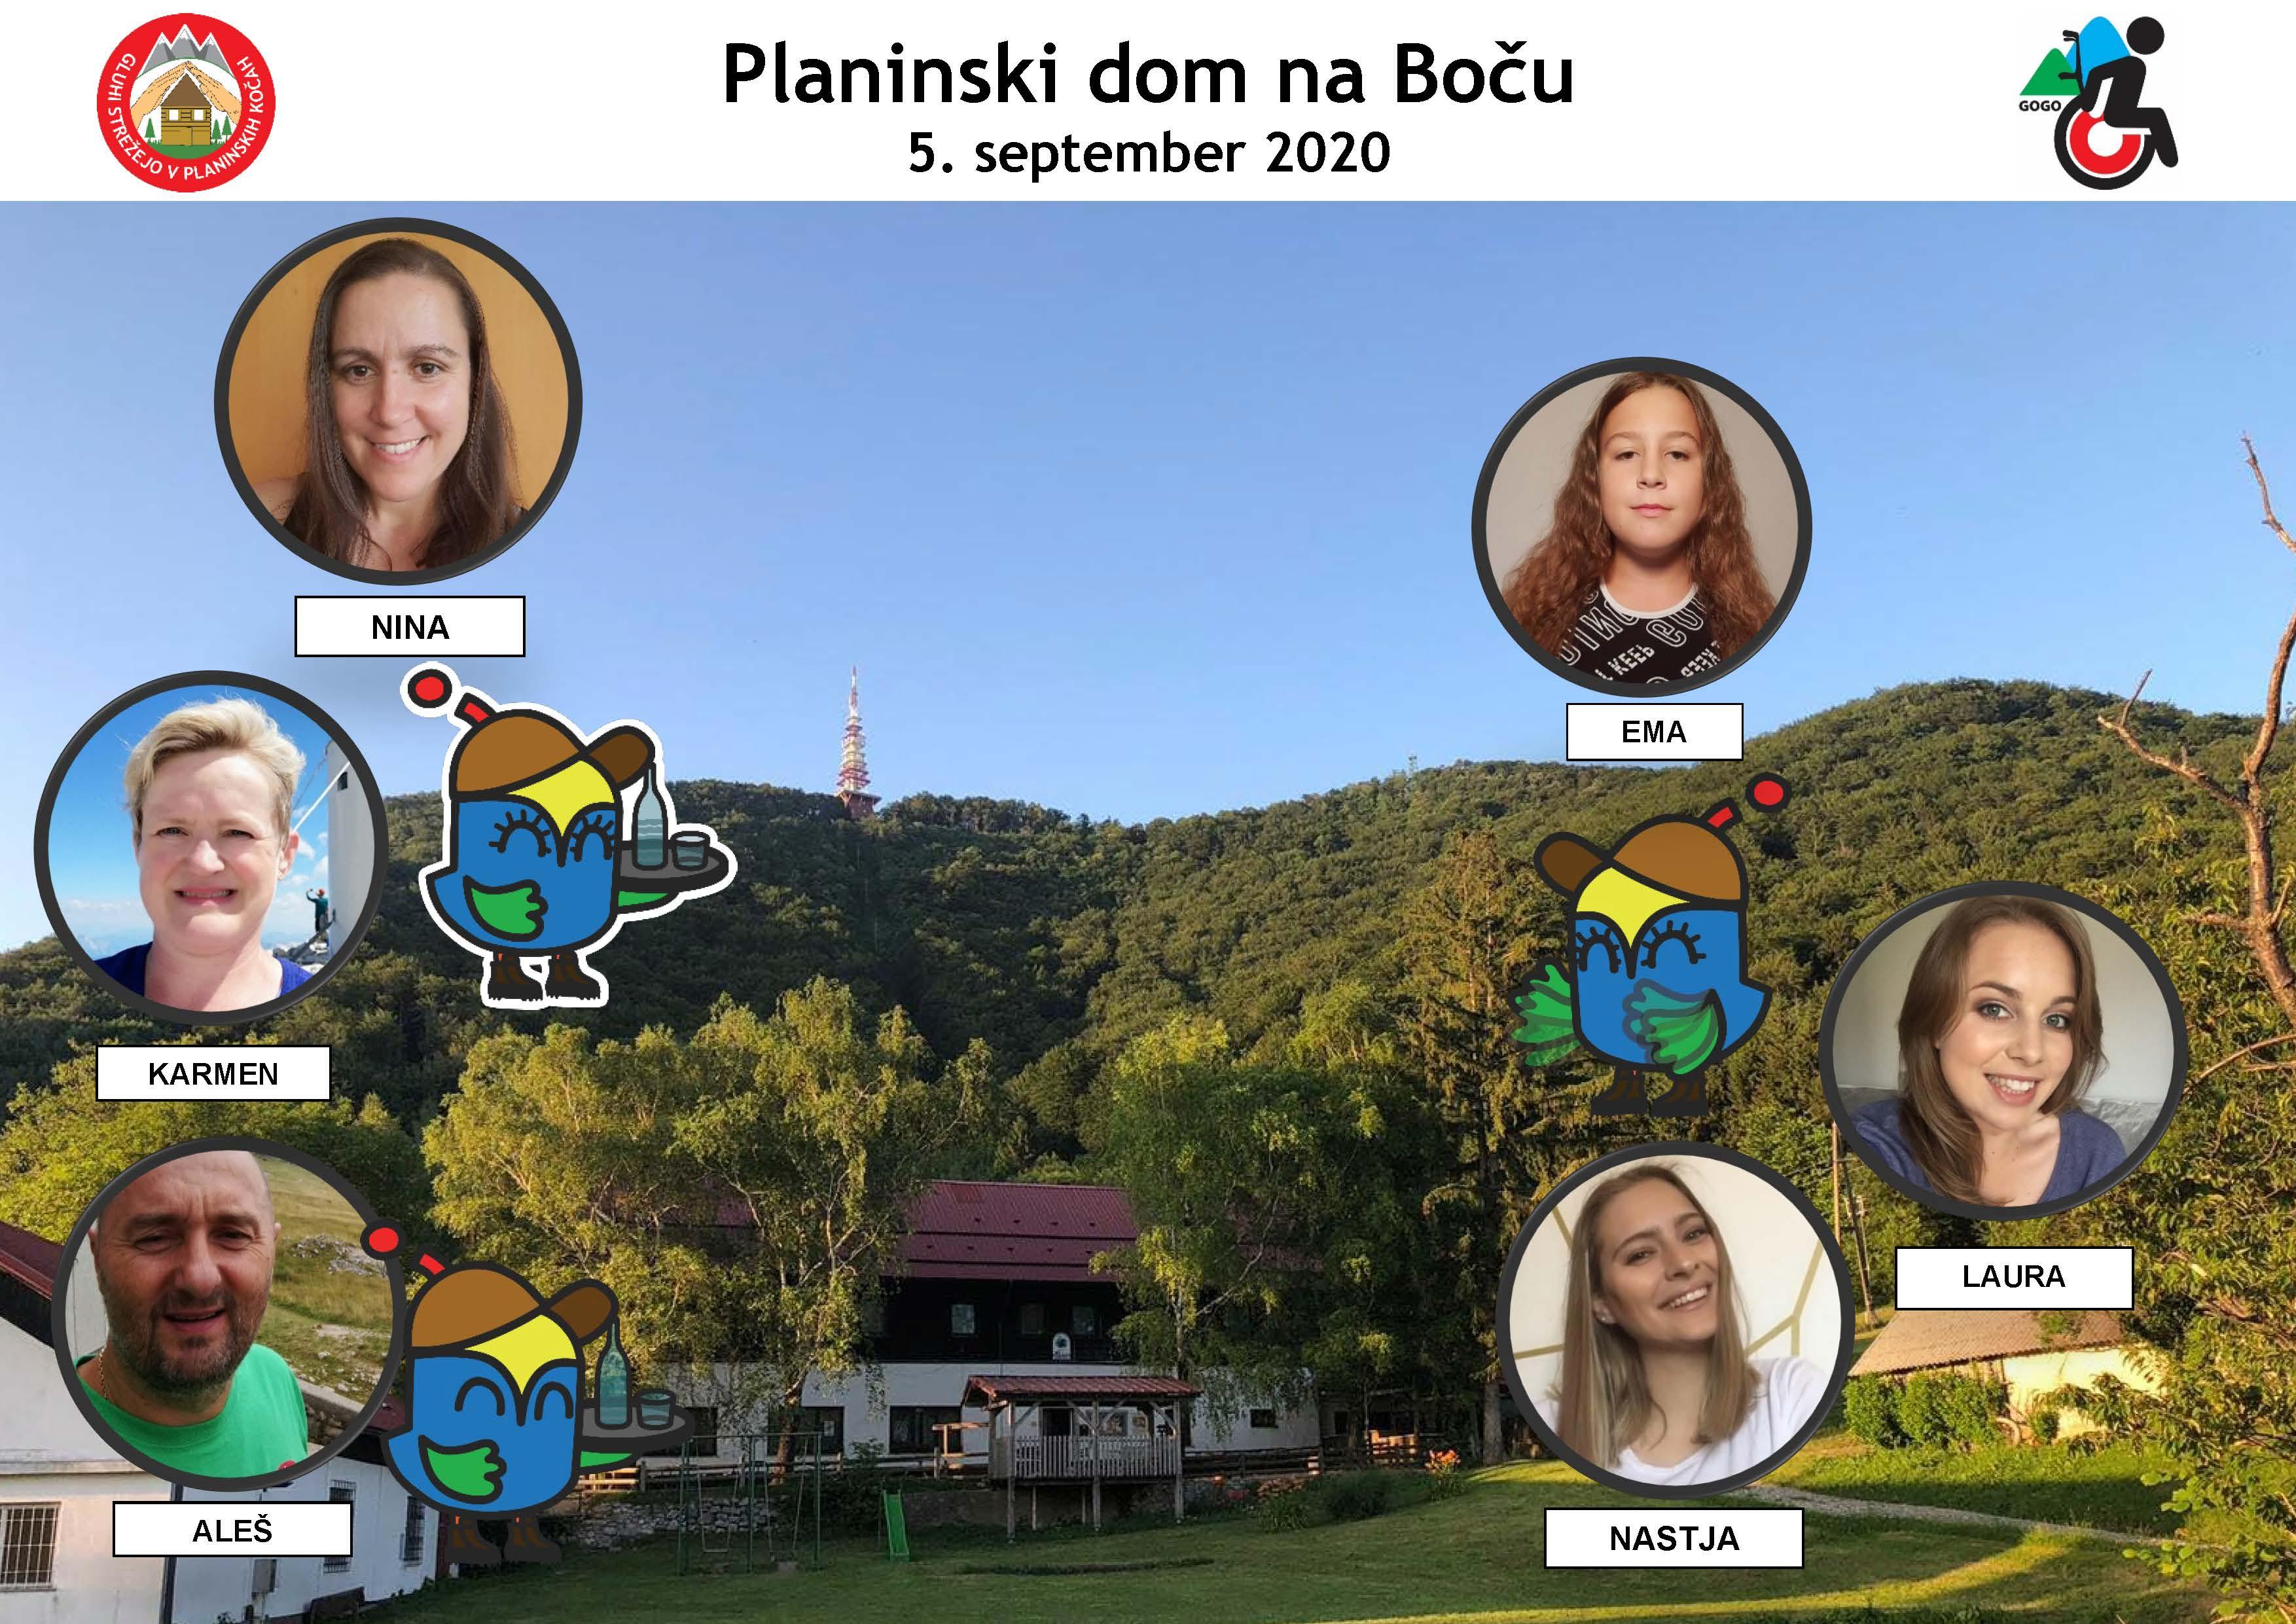 Ekipa_GSPK_BOC_PIN